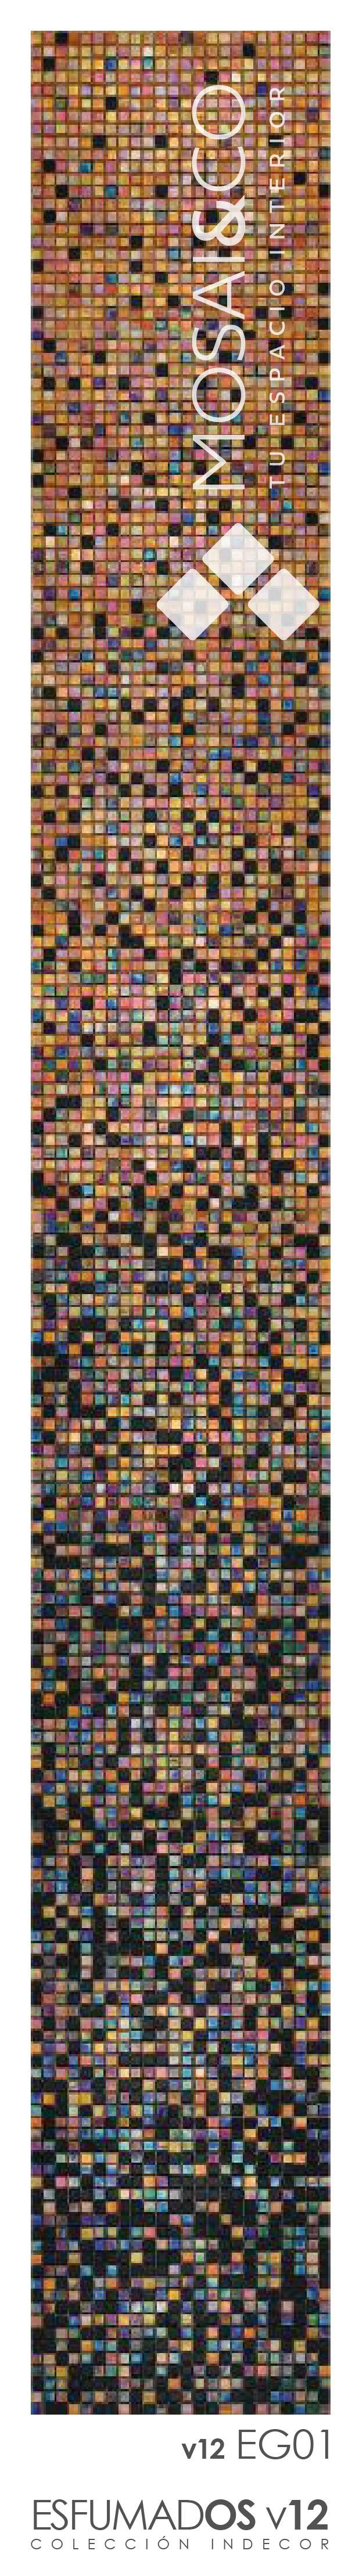 Esfumados-mosaico-v12-eg01-mosaiandco